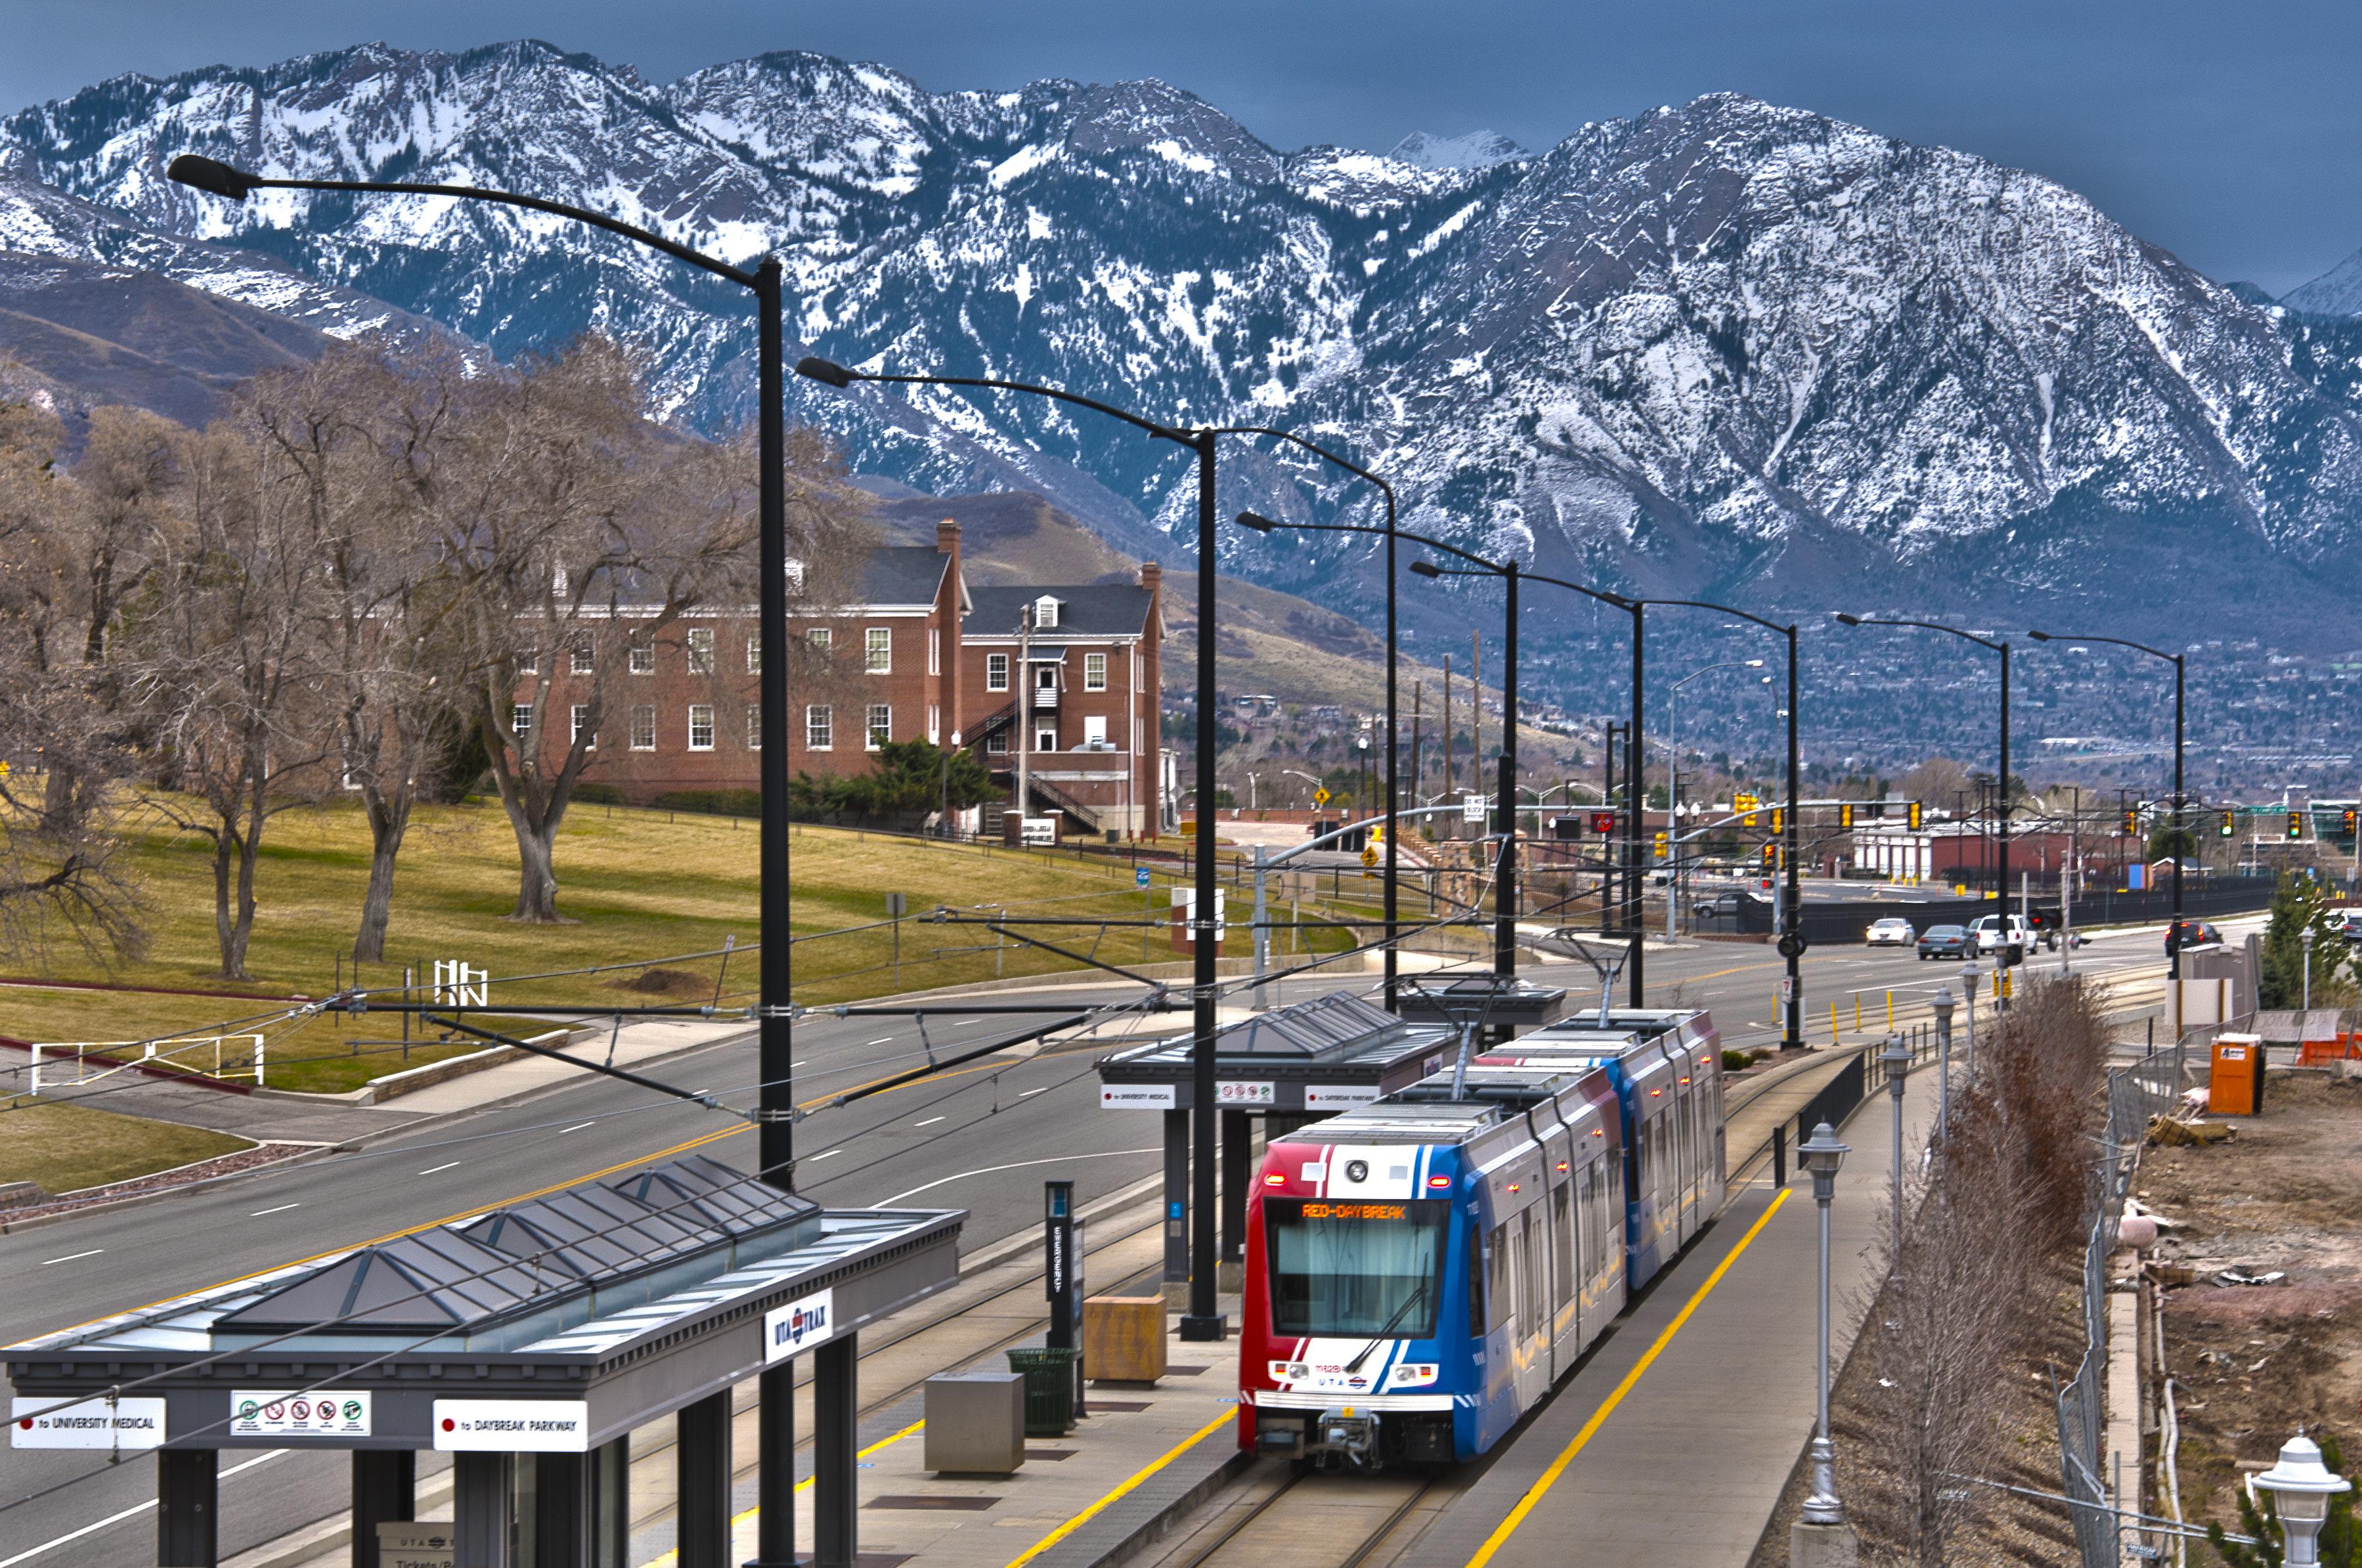 A TRAX train on Salt Lake City's extensive transit system.